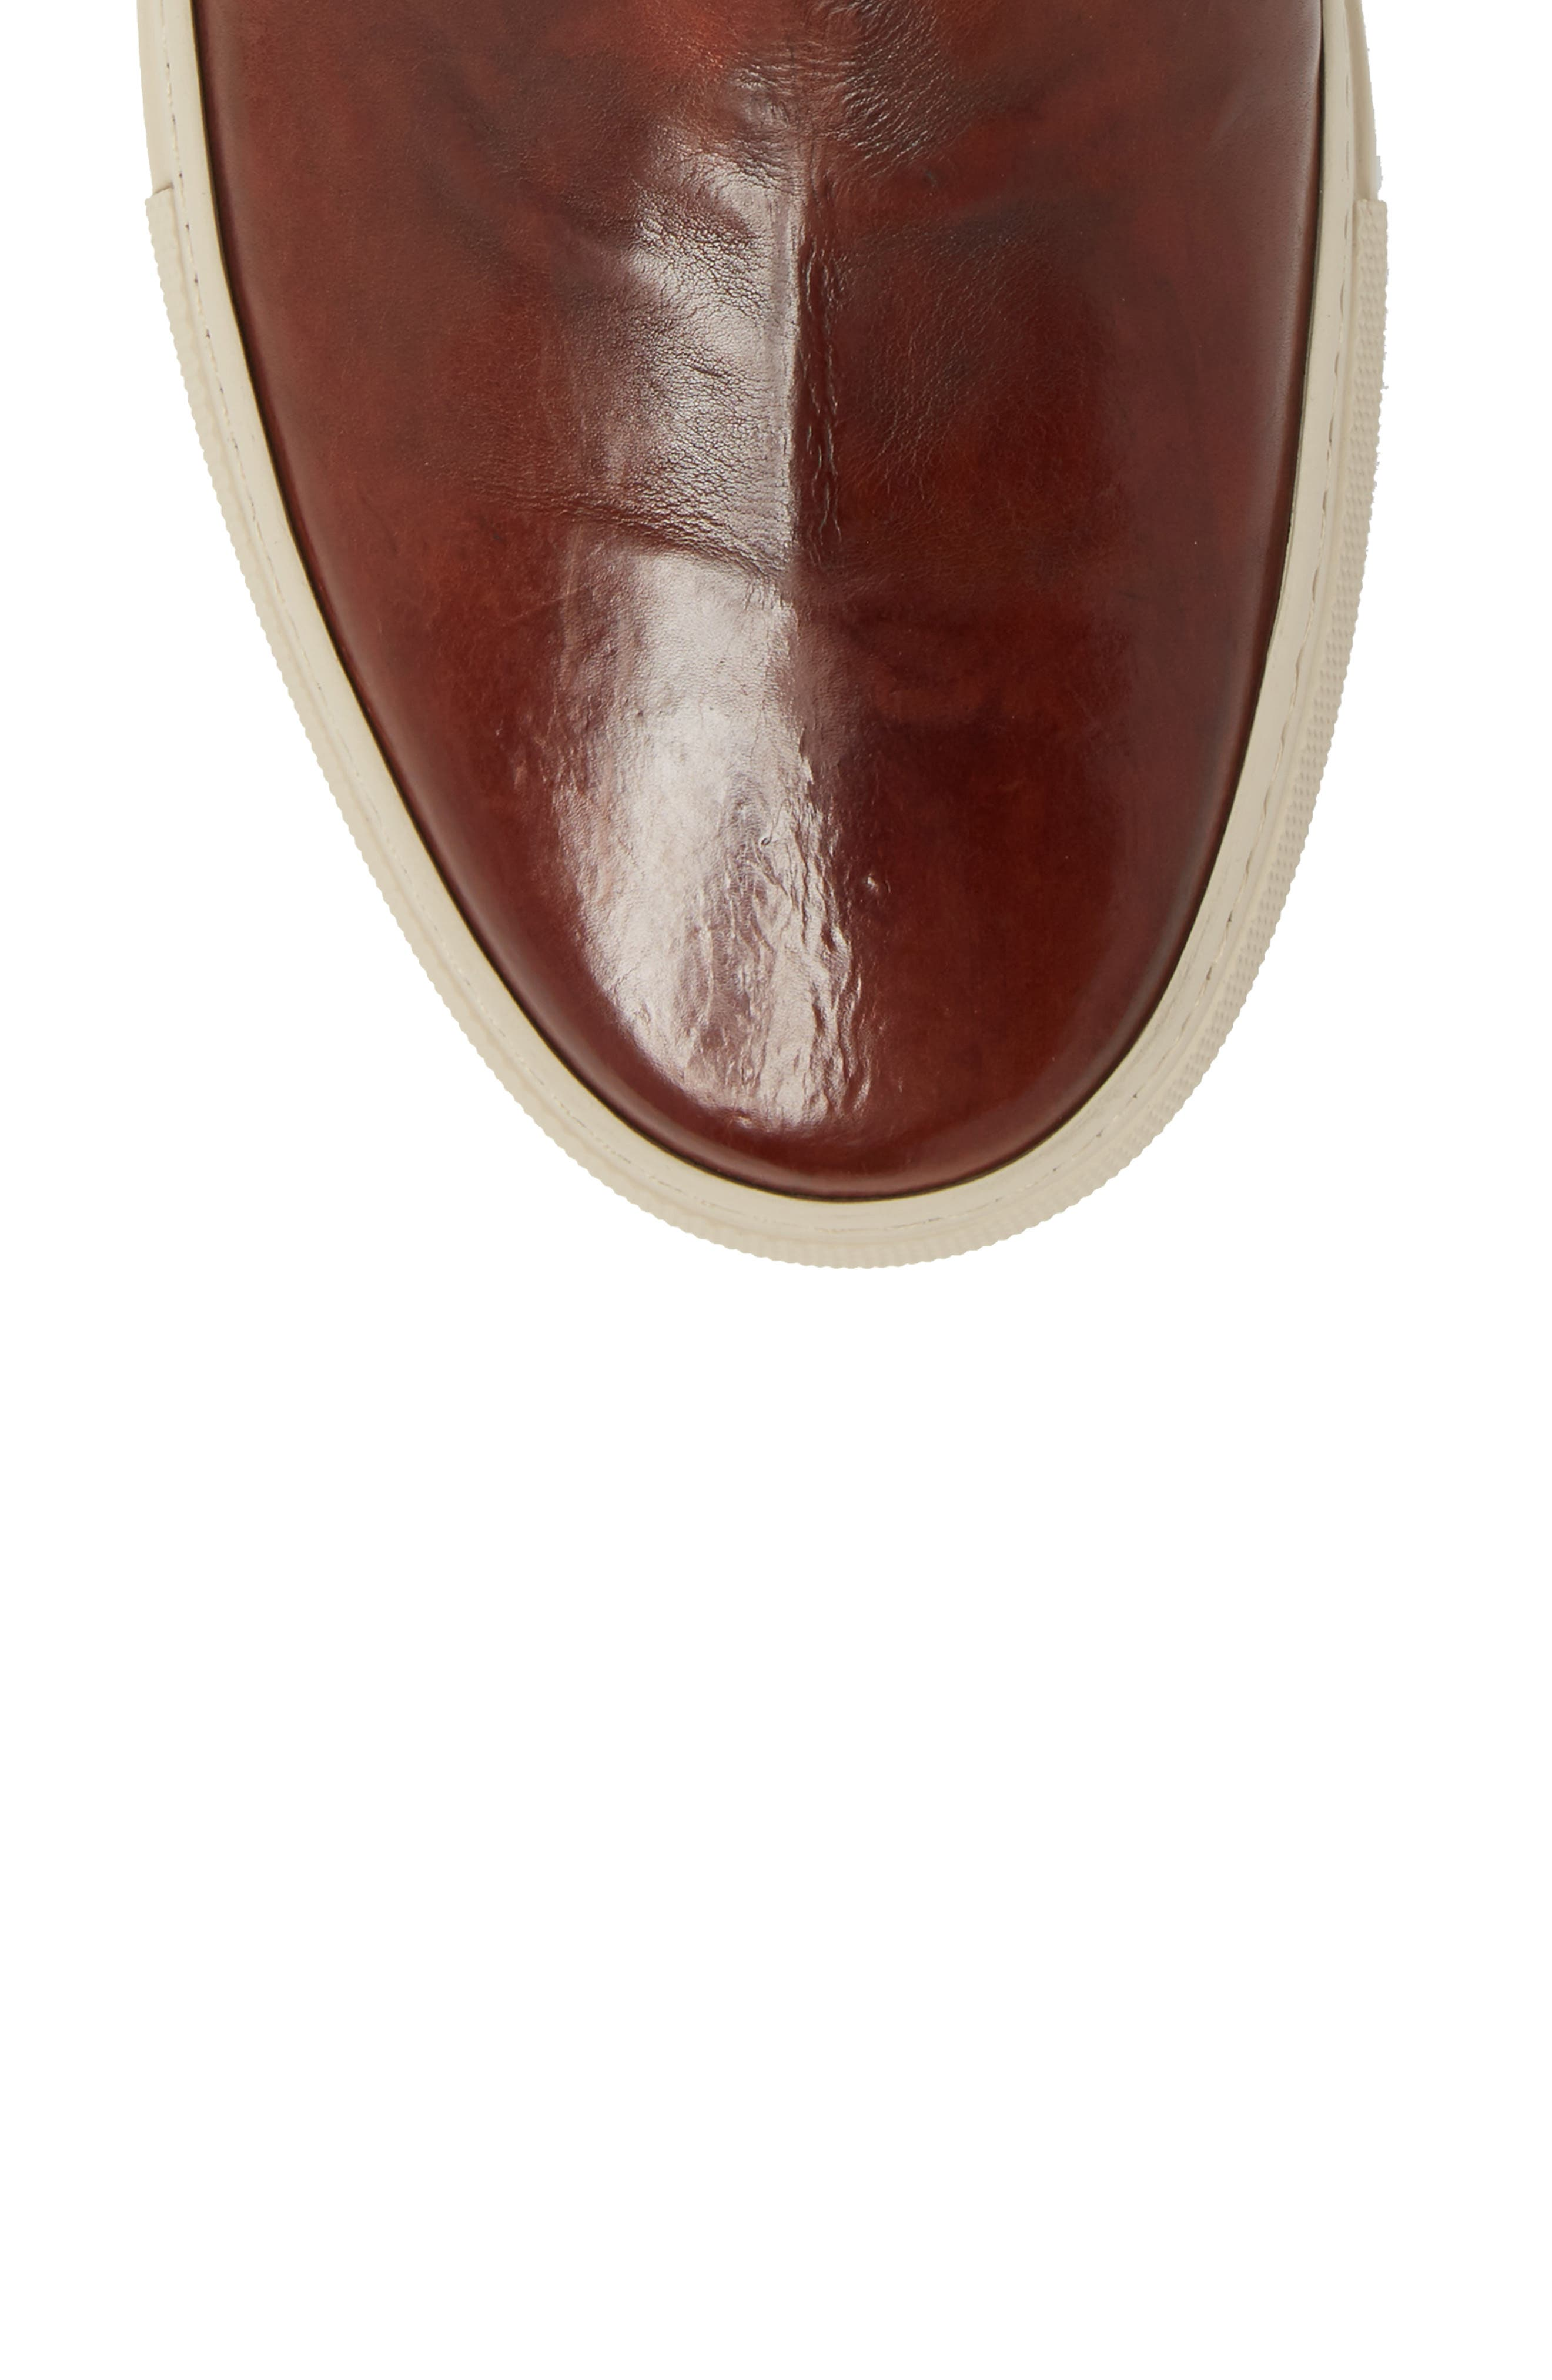 Owen Jodhpur High Top Sneaker,                             Alternate thumbnail 5, color,                             Redwood Leather